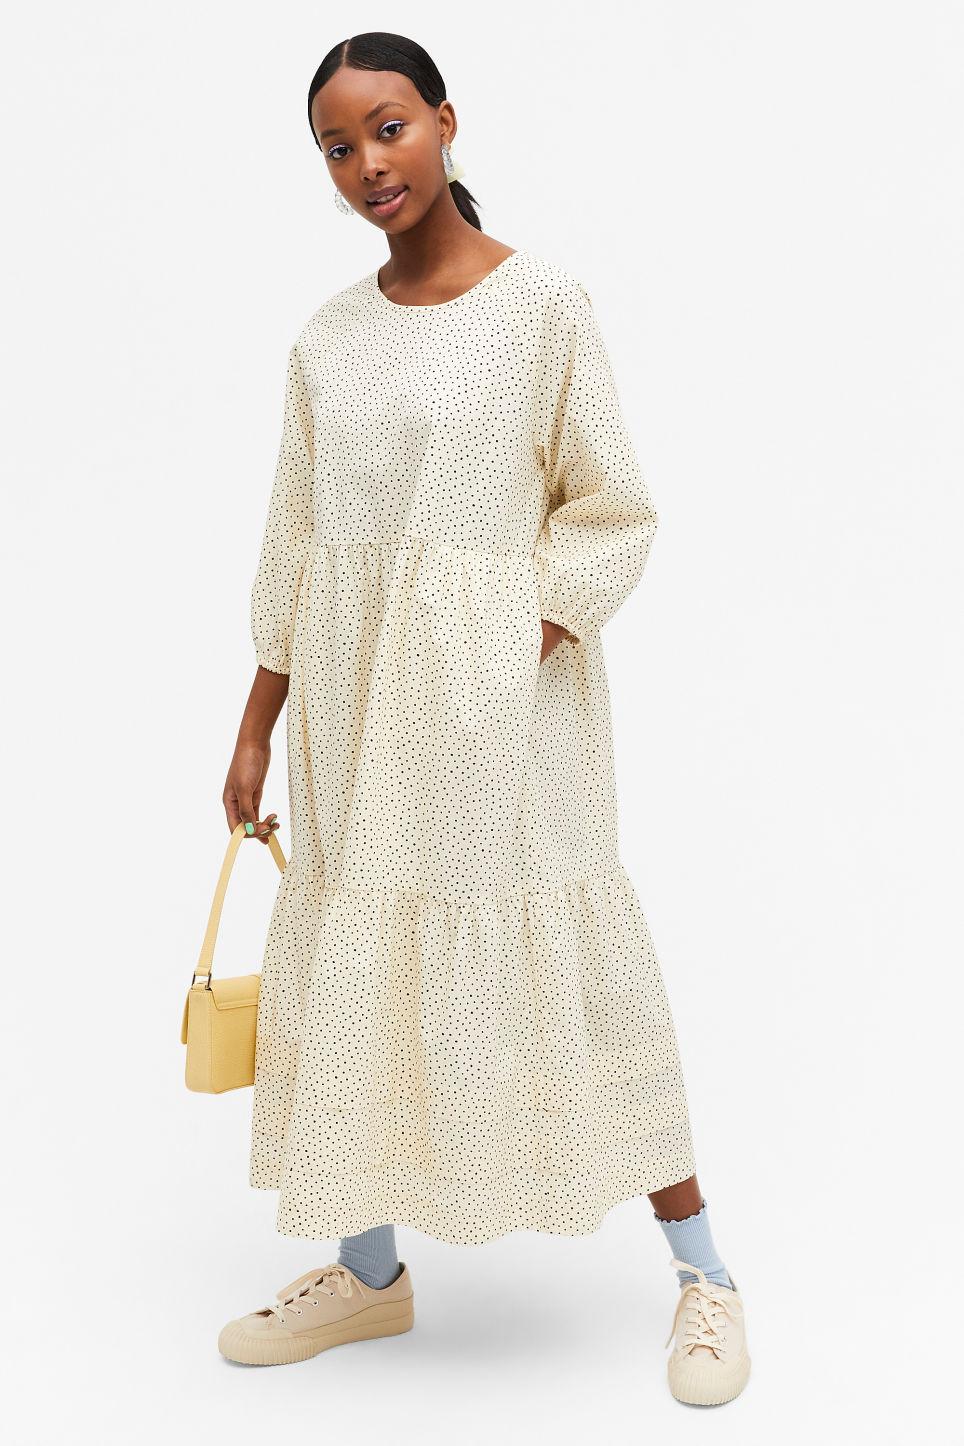 Covid kjoler 2